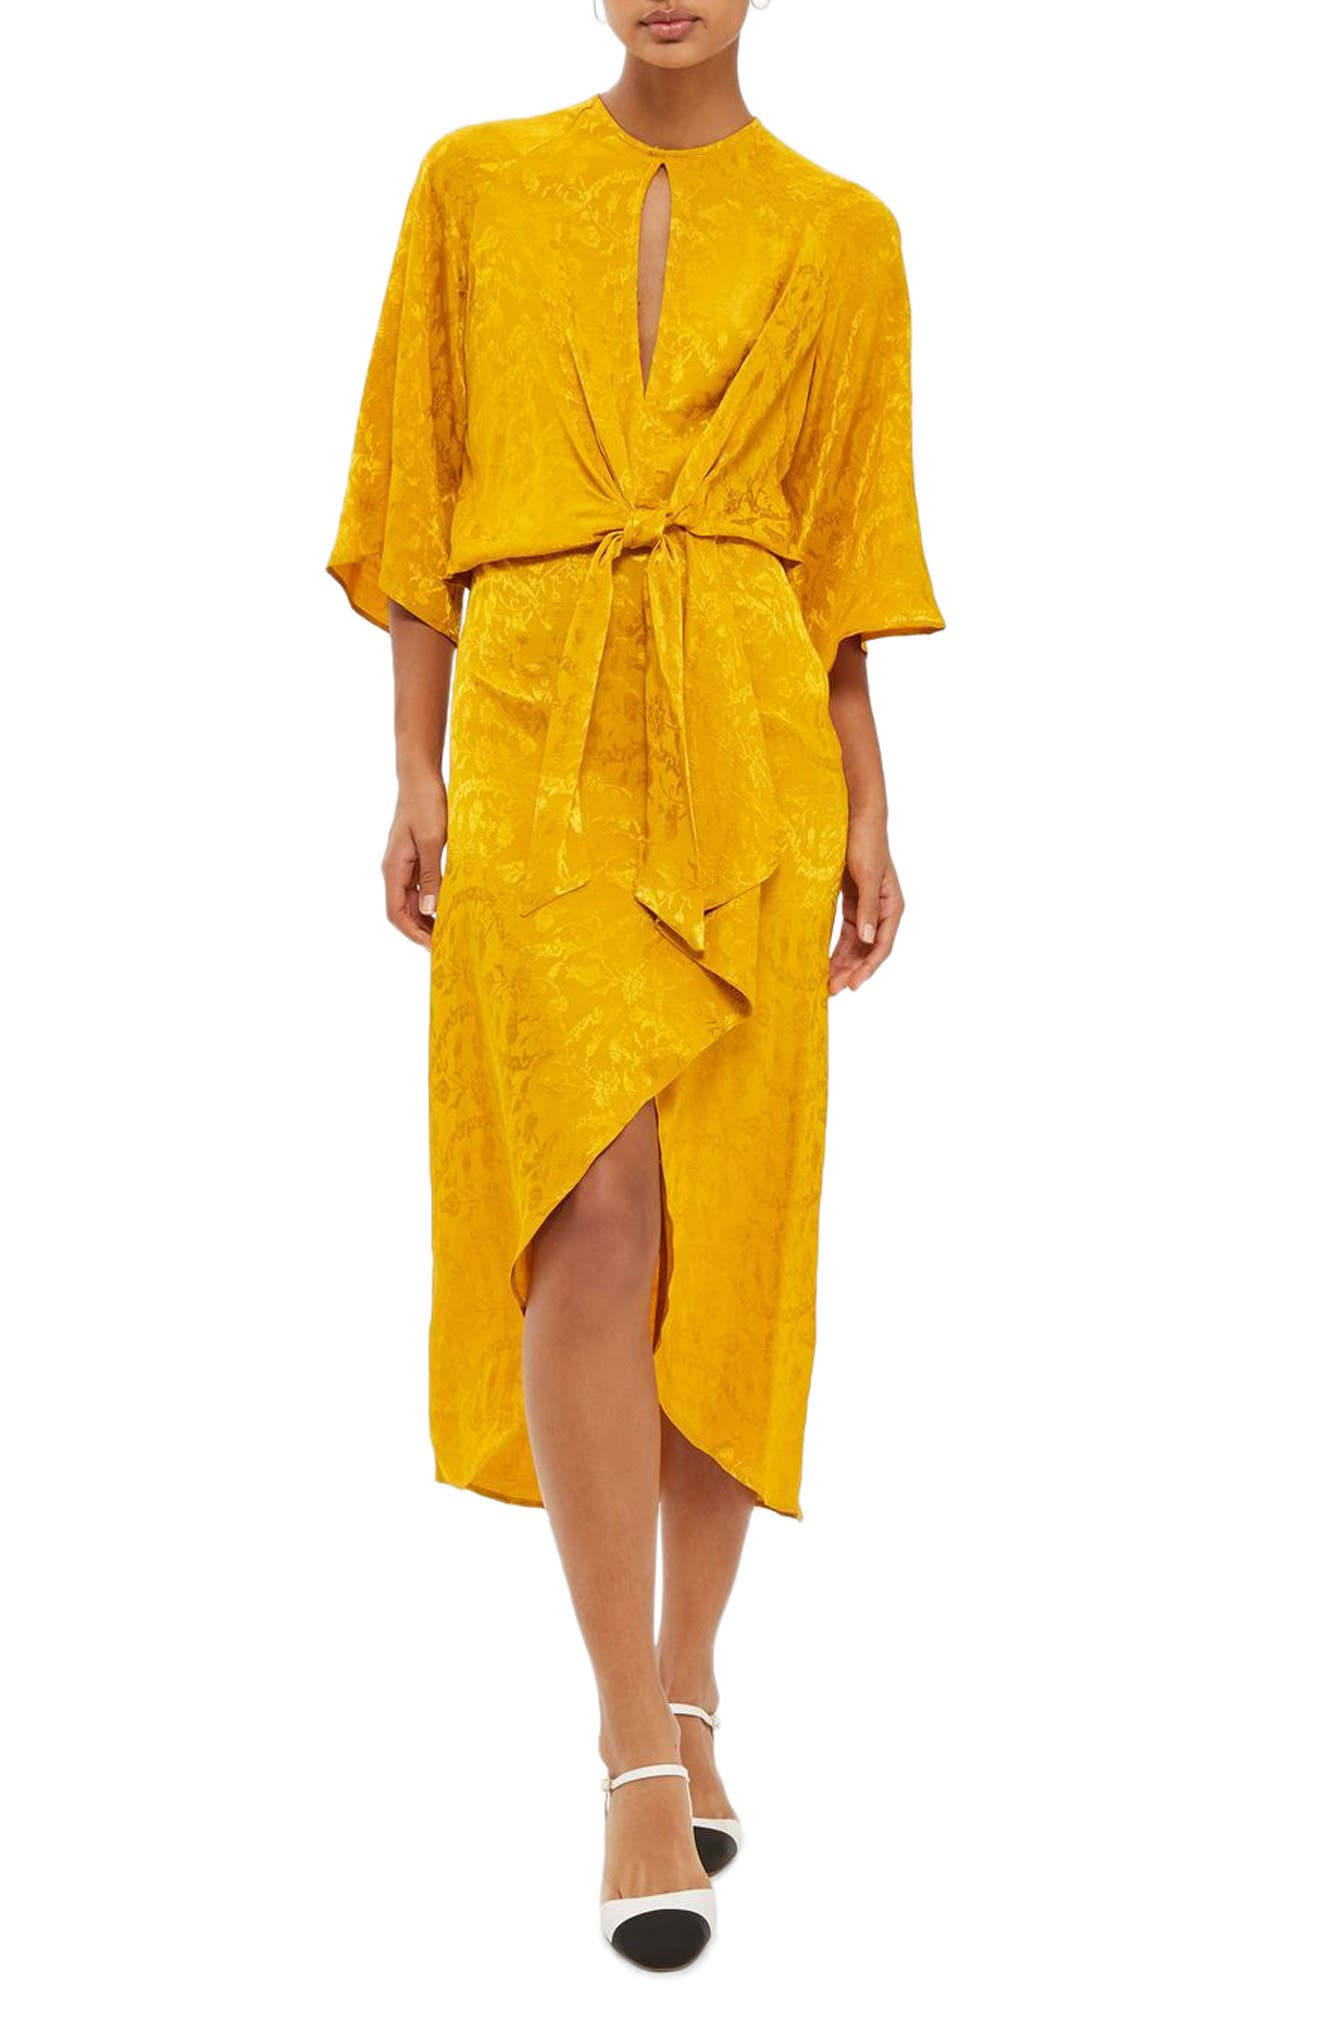 Yellow nordstrom dress